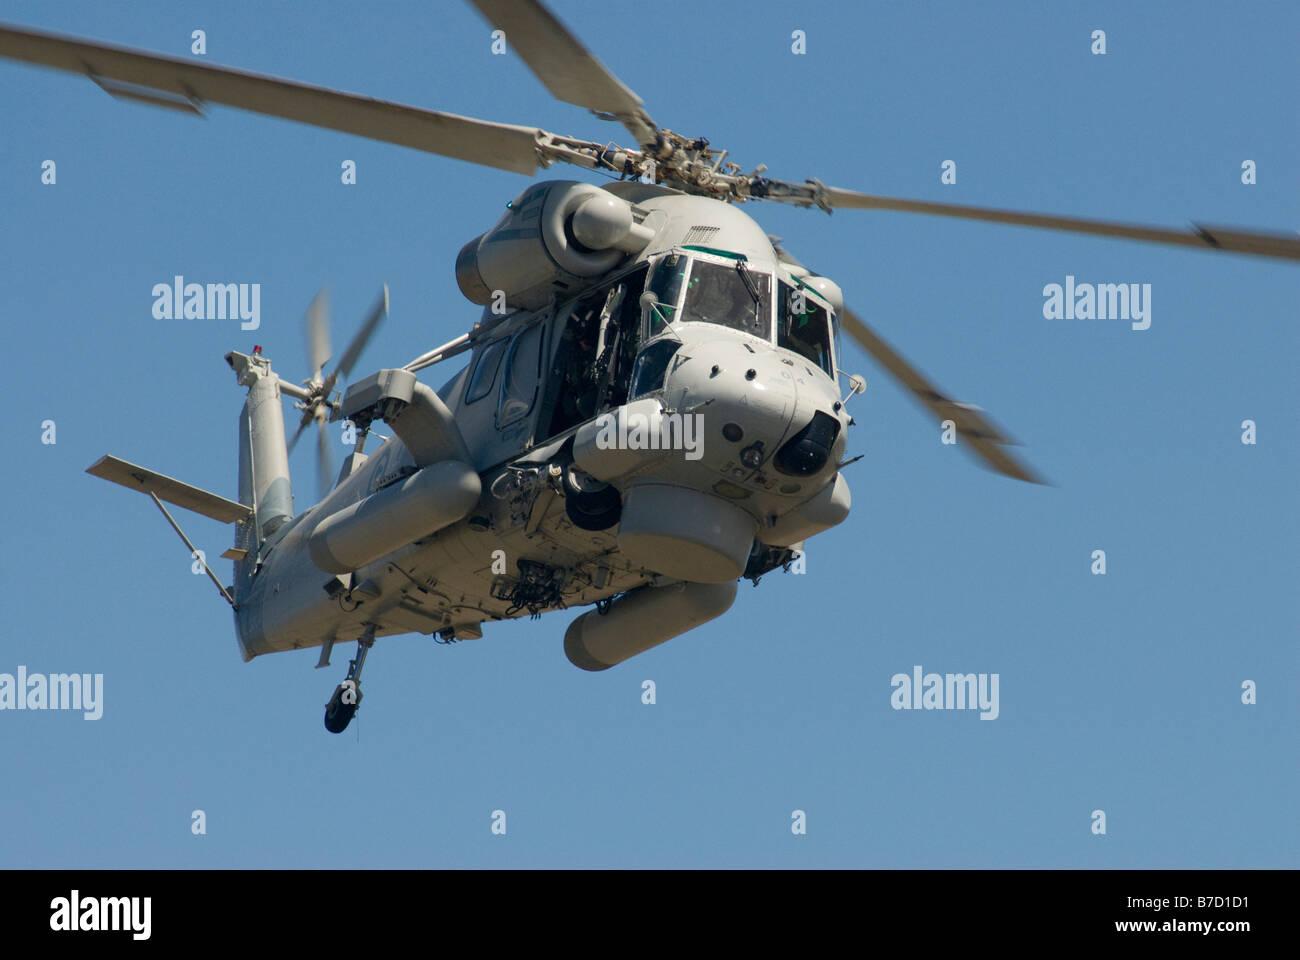 Kaman SH-2 Seasprite - Wikipedia